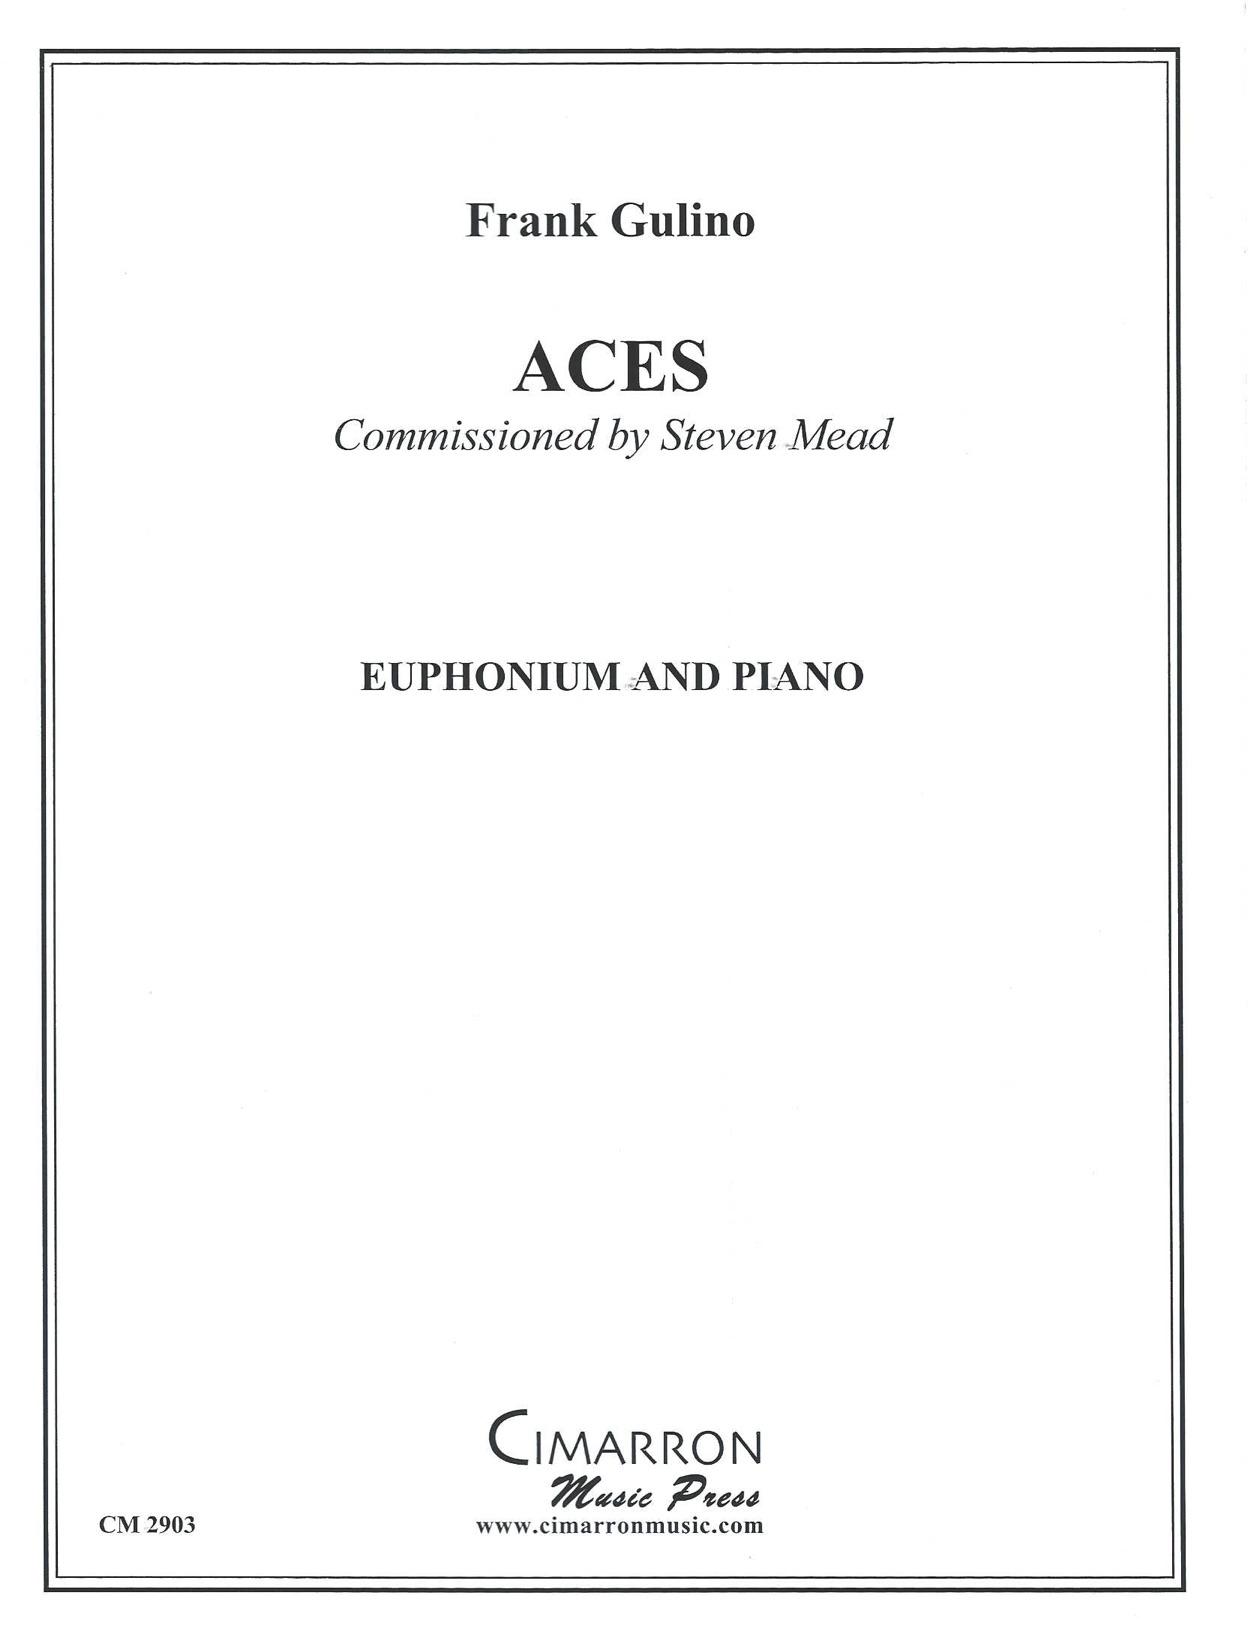 Aces - (Frank Gulino) - Euphonium solo with piano accompaniment